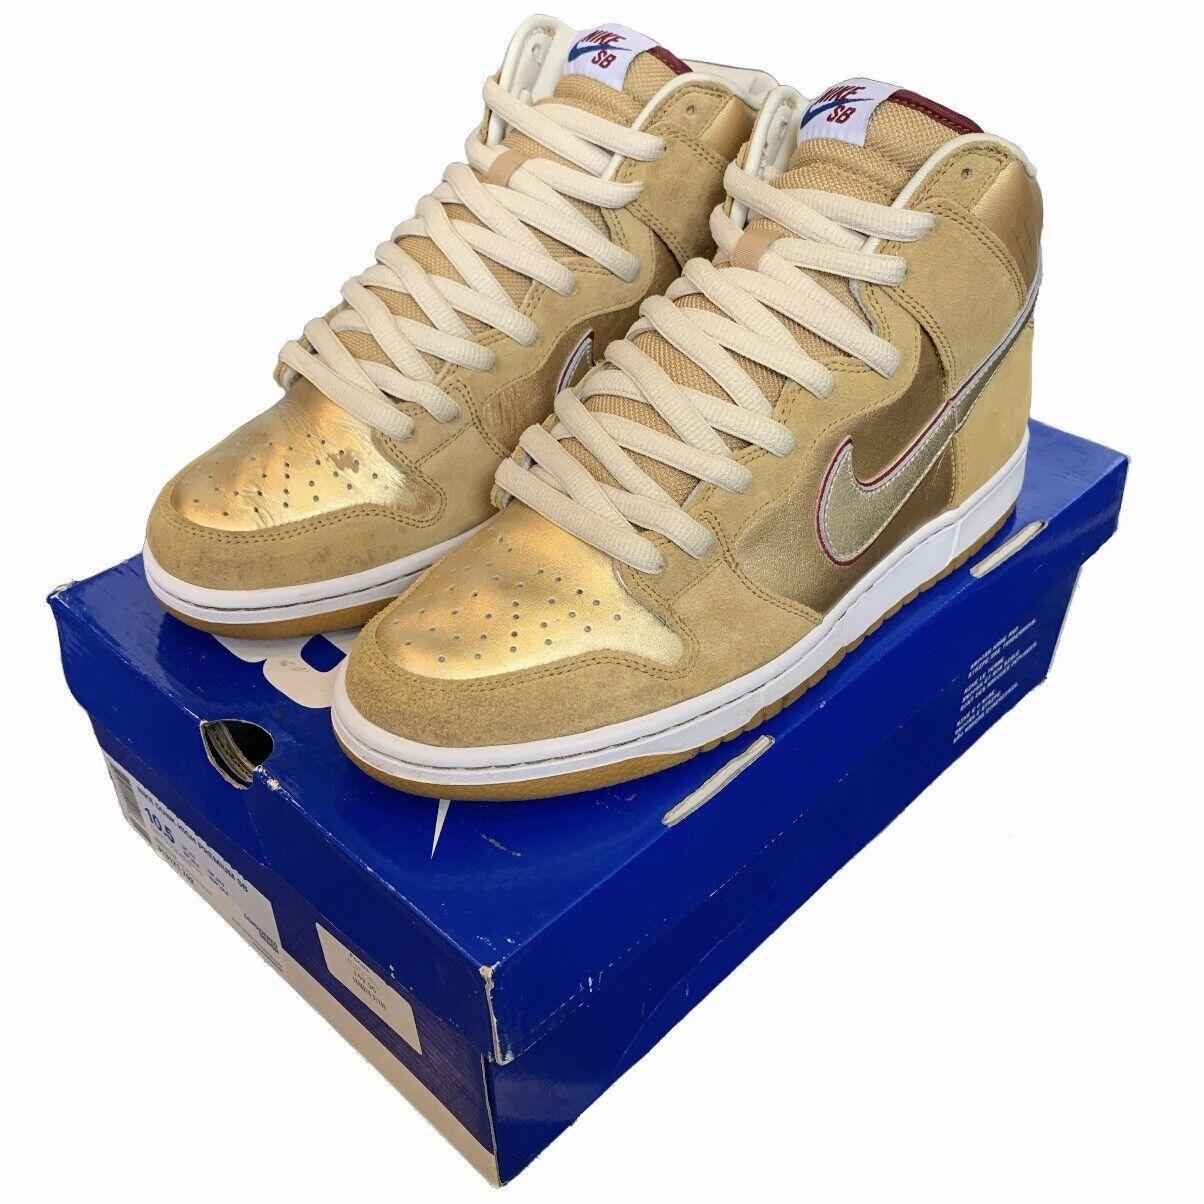 Nike SB Dunk High Premium Eric Koston tailandés templo UK9.5US10.5EU44.5 Usado Raro